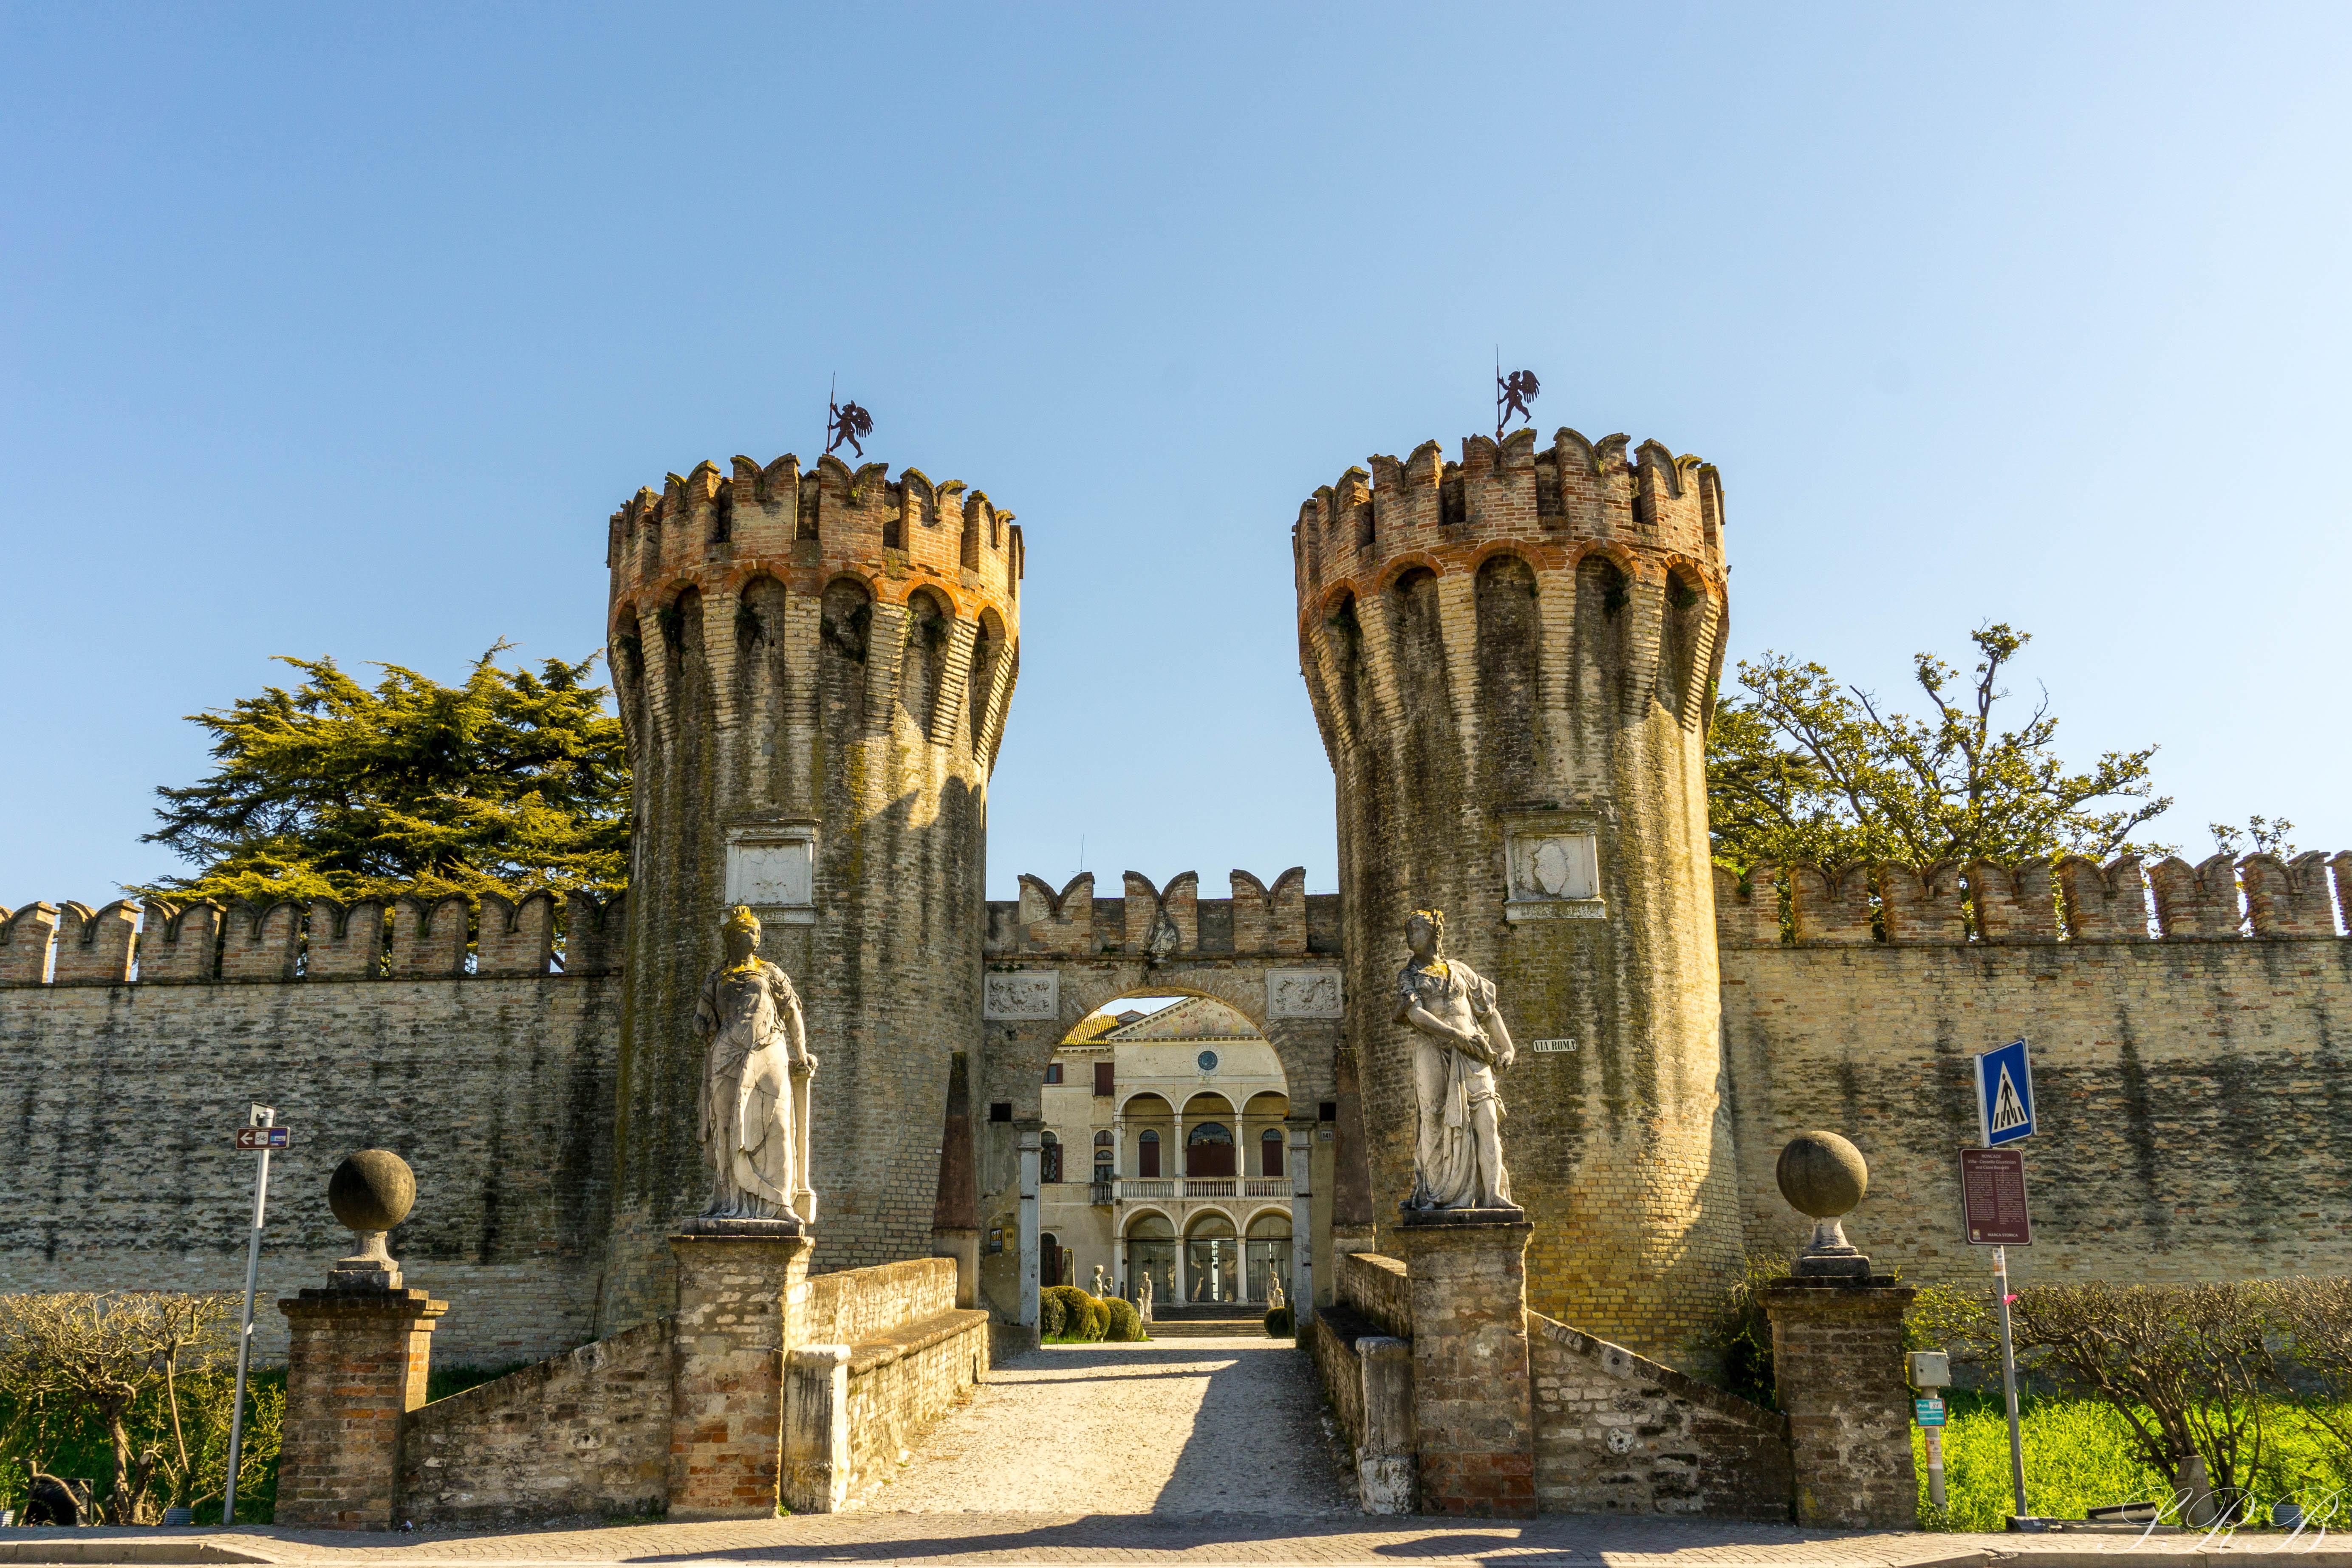 Entrance to Castello di Rocande, Province of Treviso, Italy